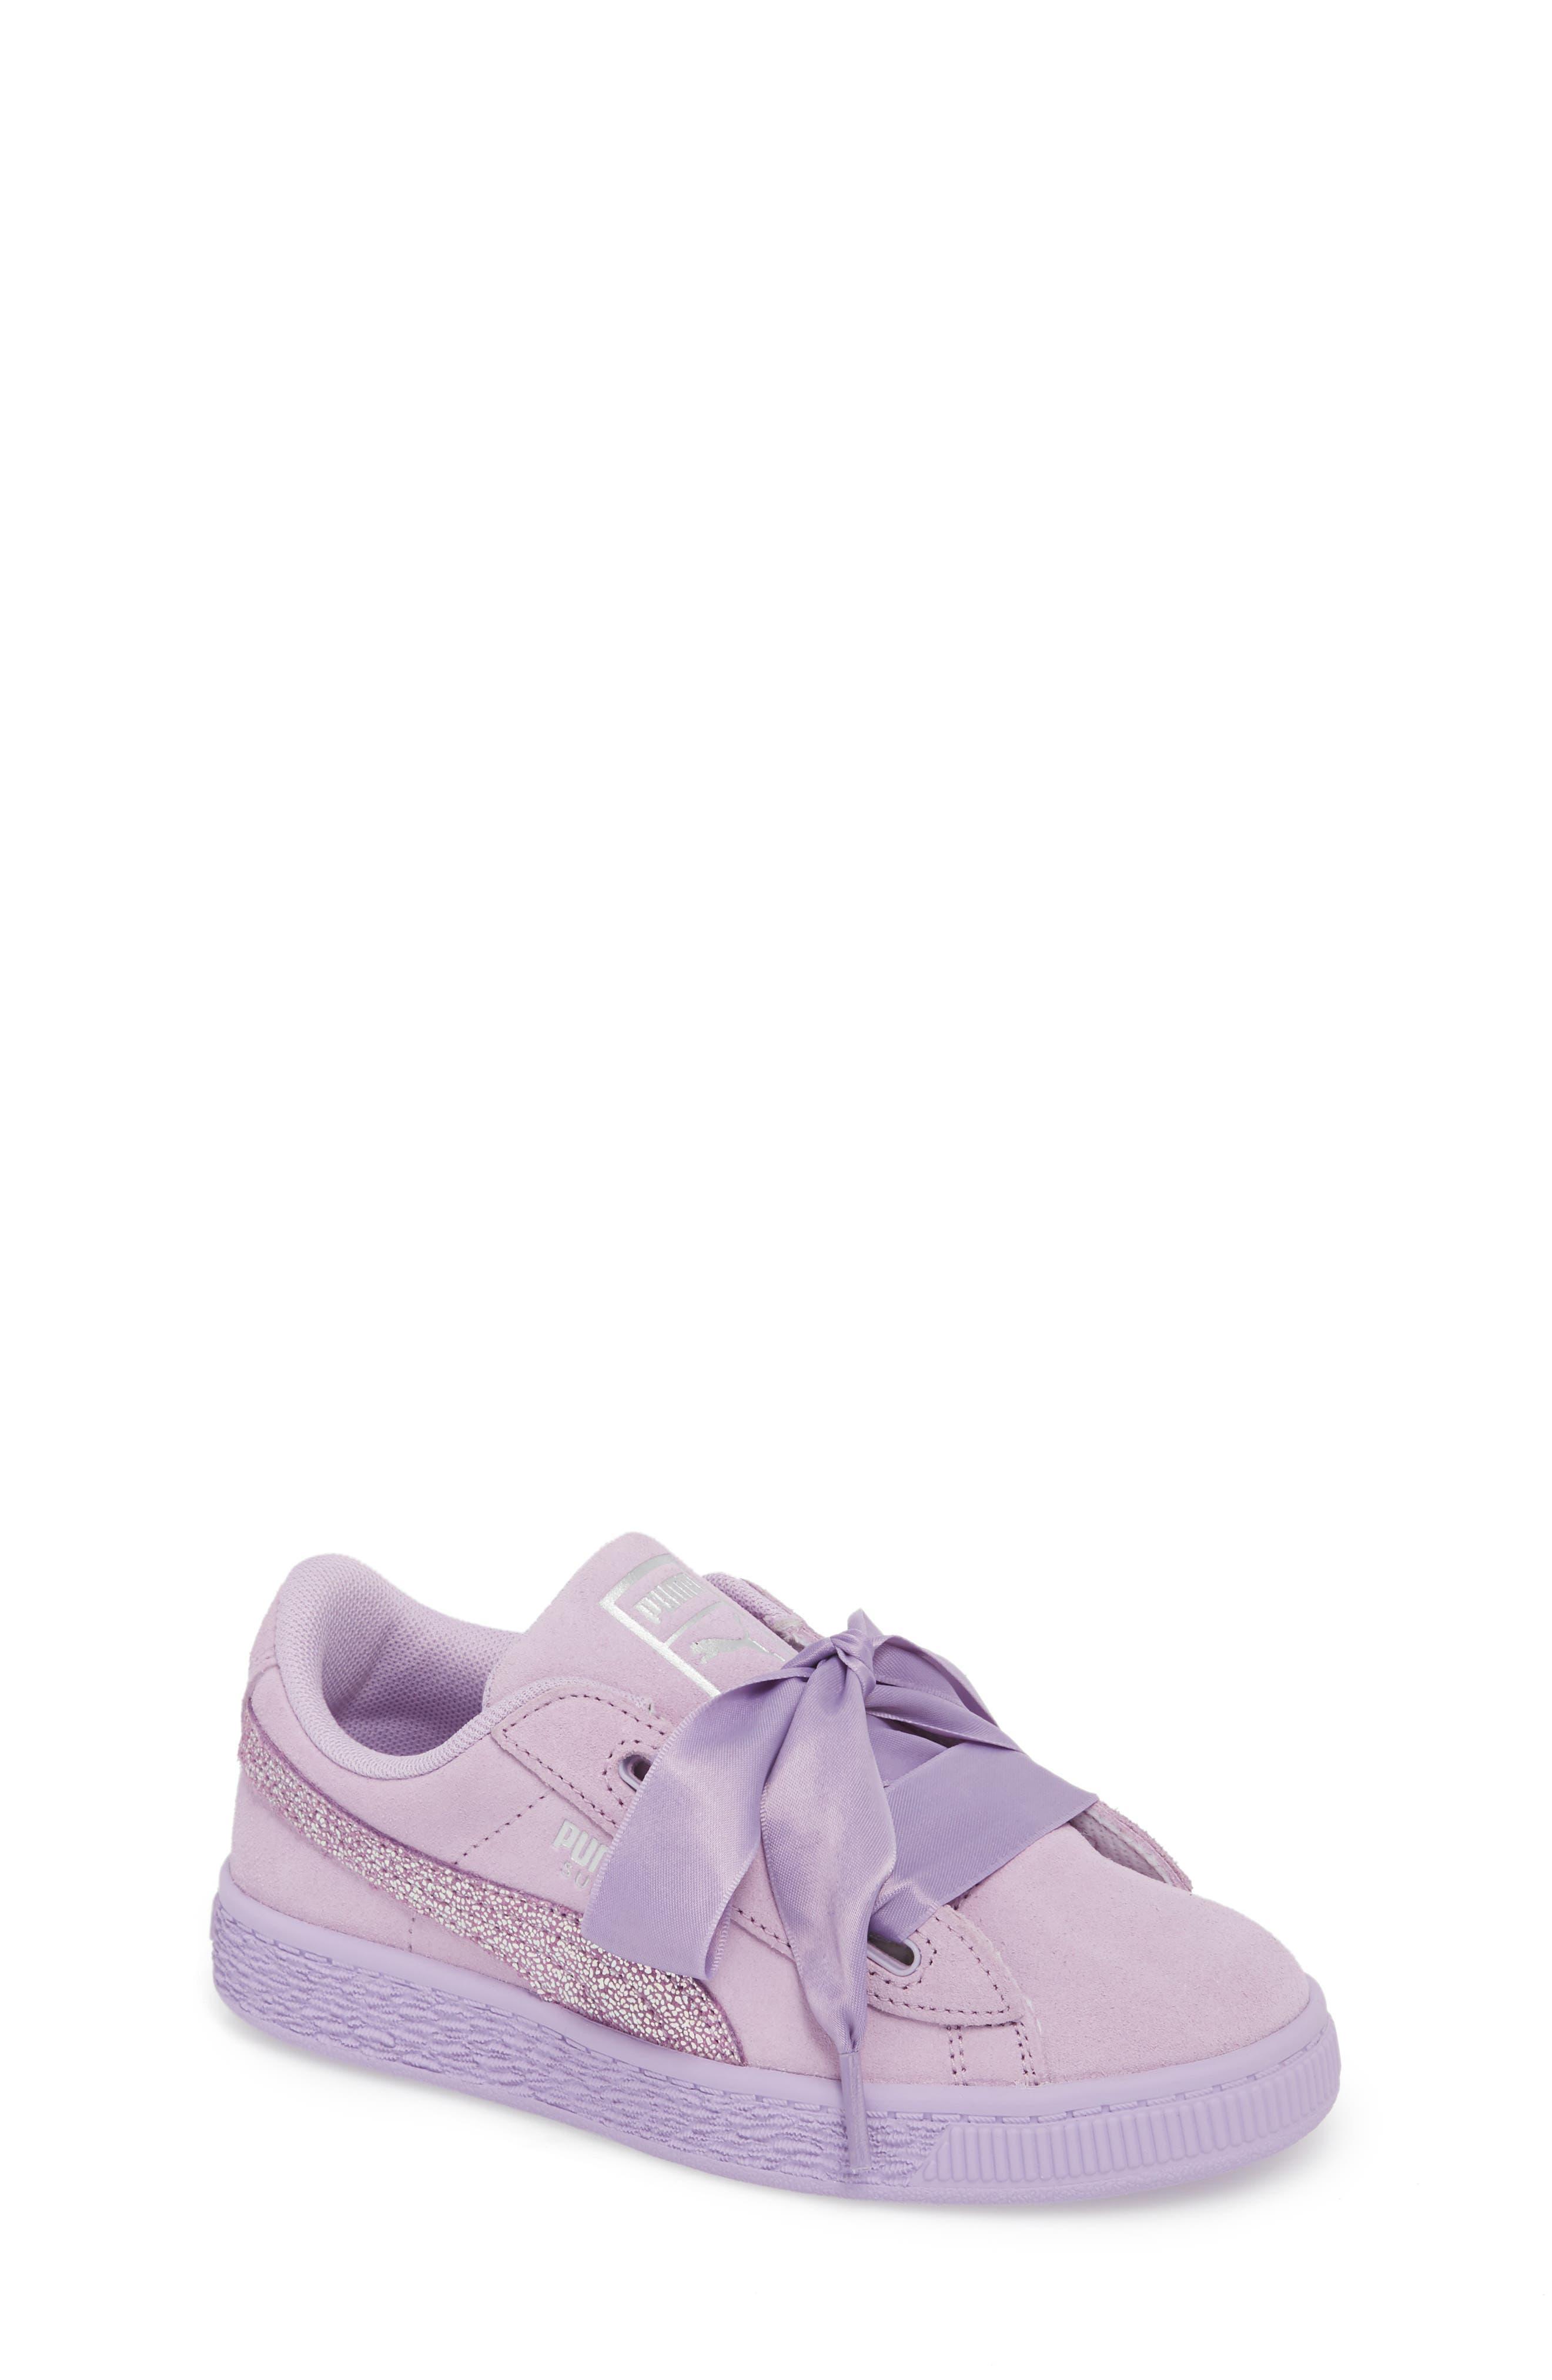 PUMA Basket Heart Glitz Sneaker (Toddler, Little Kid & Big Kid)